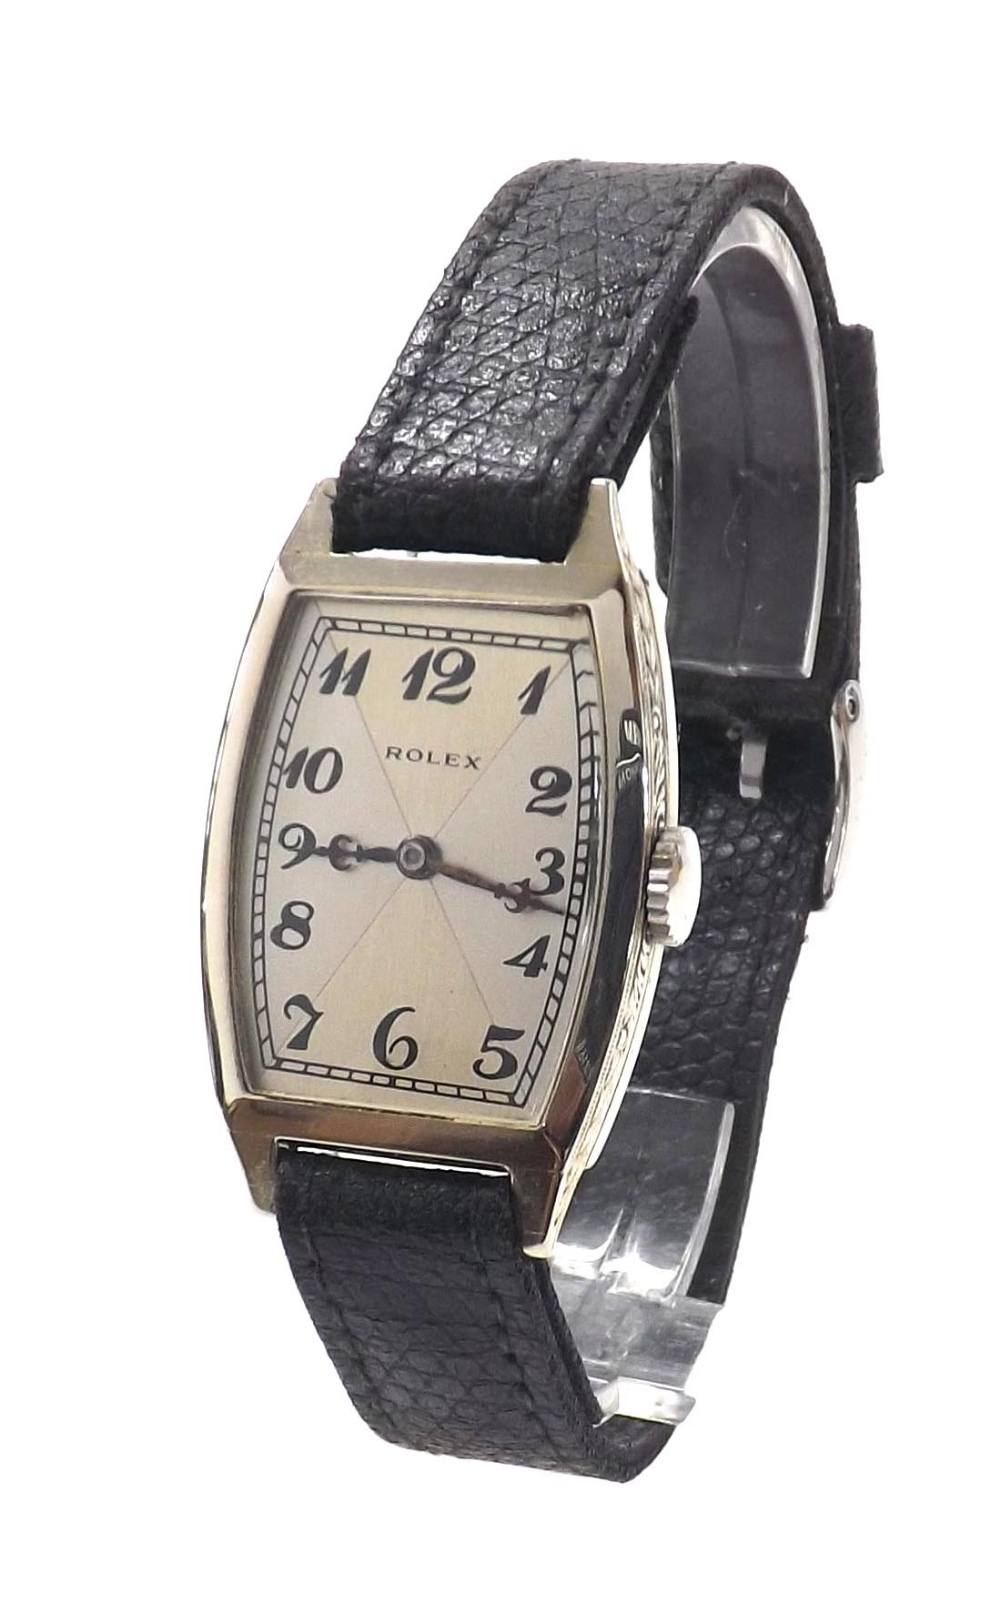 Lot 45 - Rolex 18k white gold gentleman's wristwatch, circa 1920s, serial no. 1xxxx23, the tonneau silvered